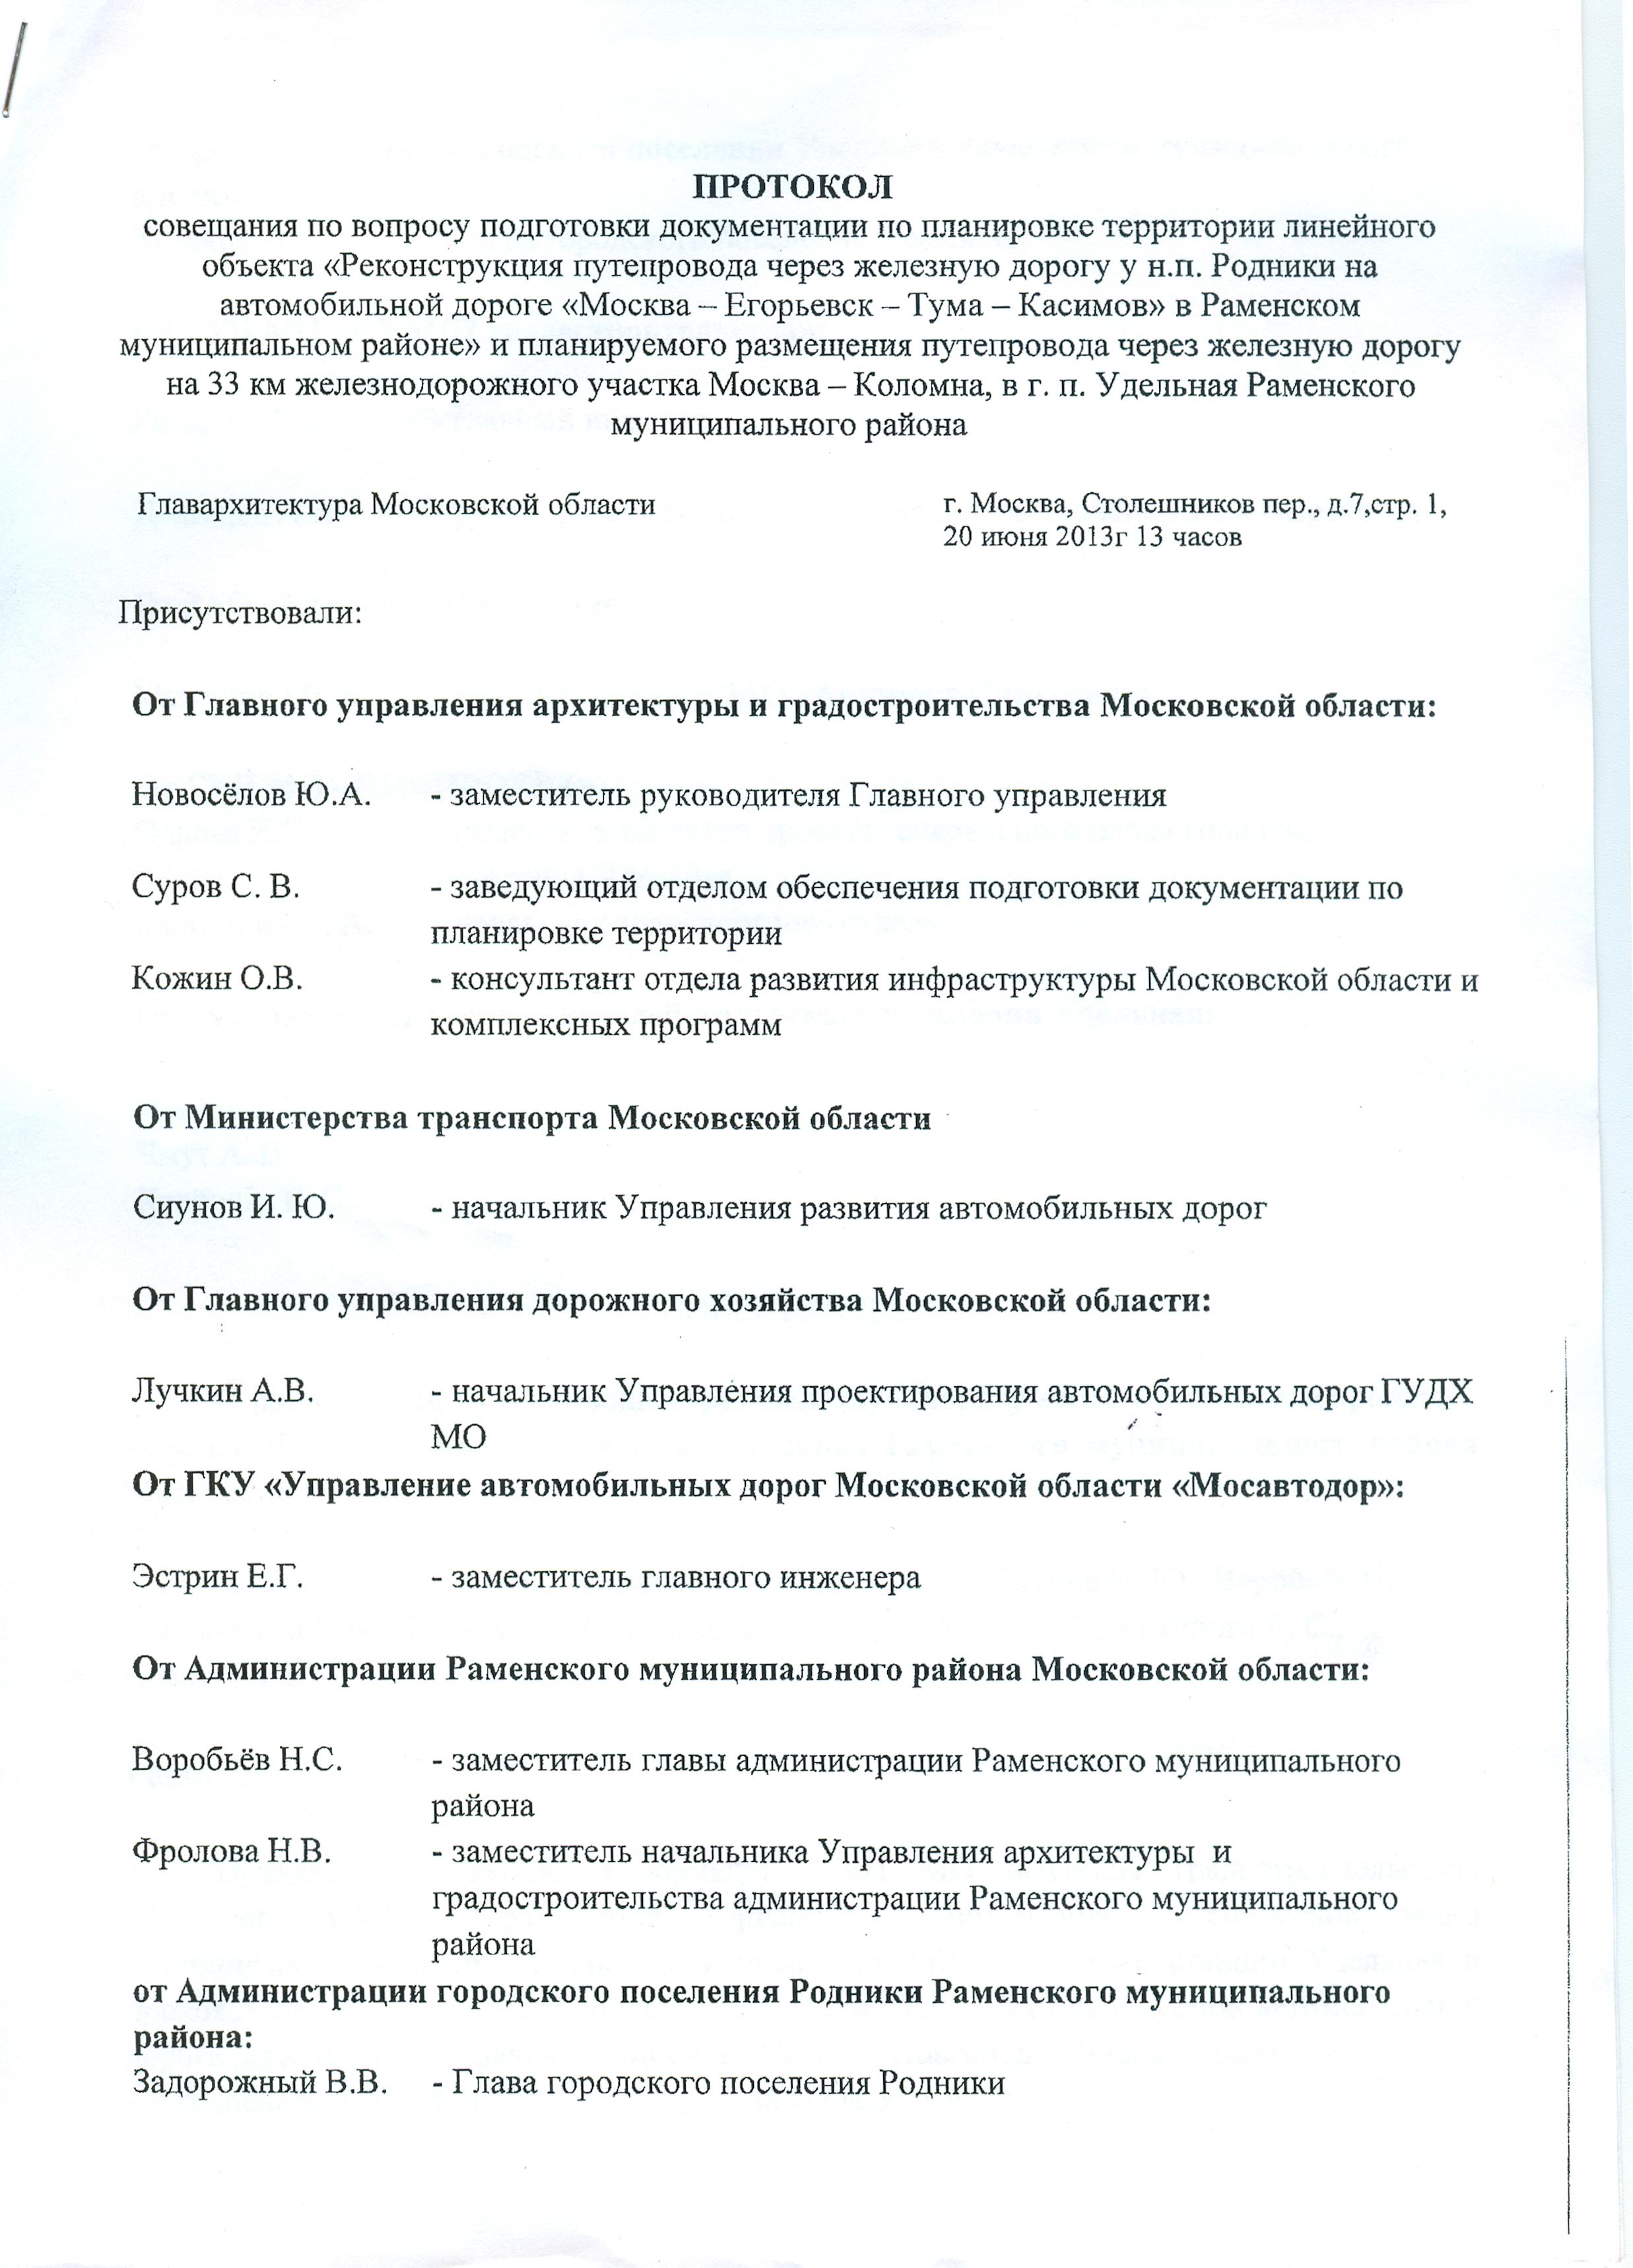 протокол тех сов1